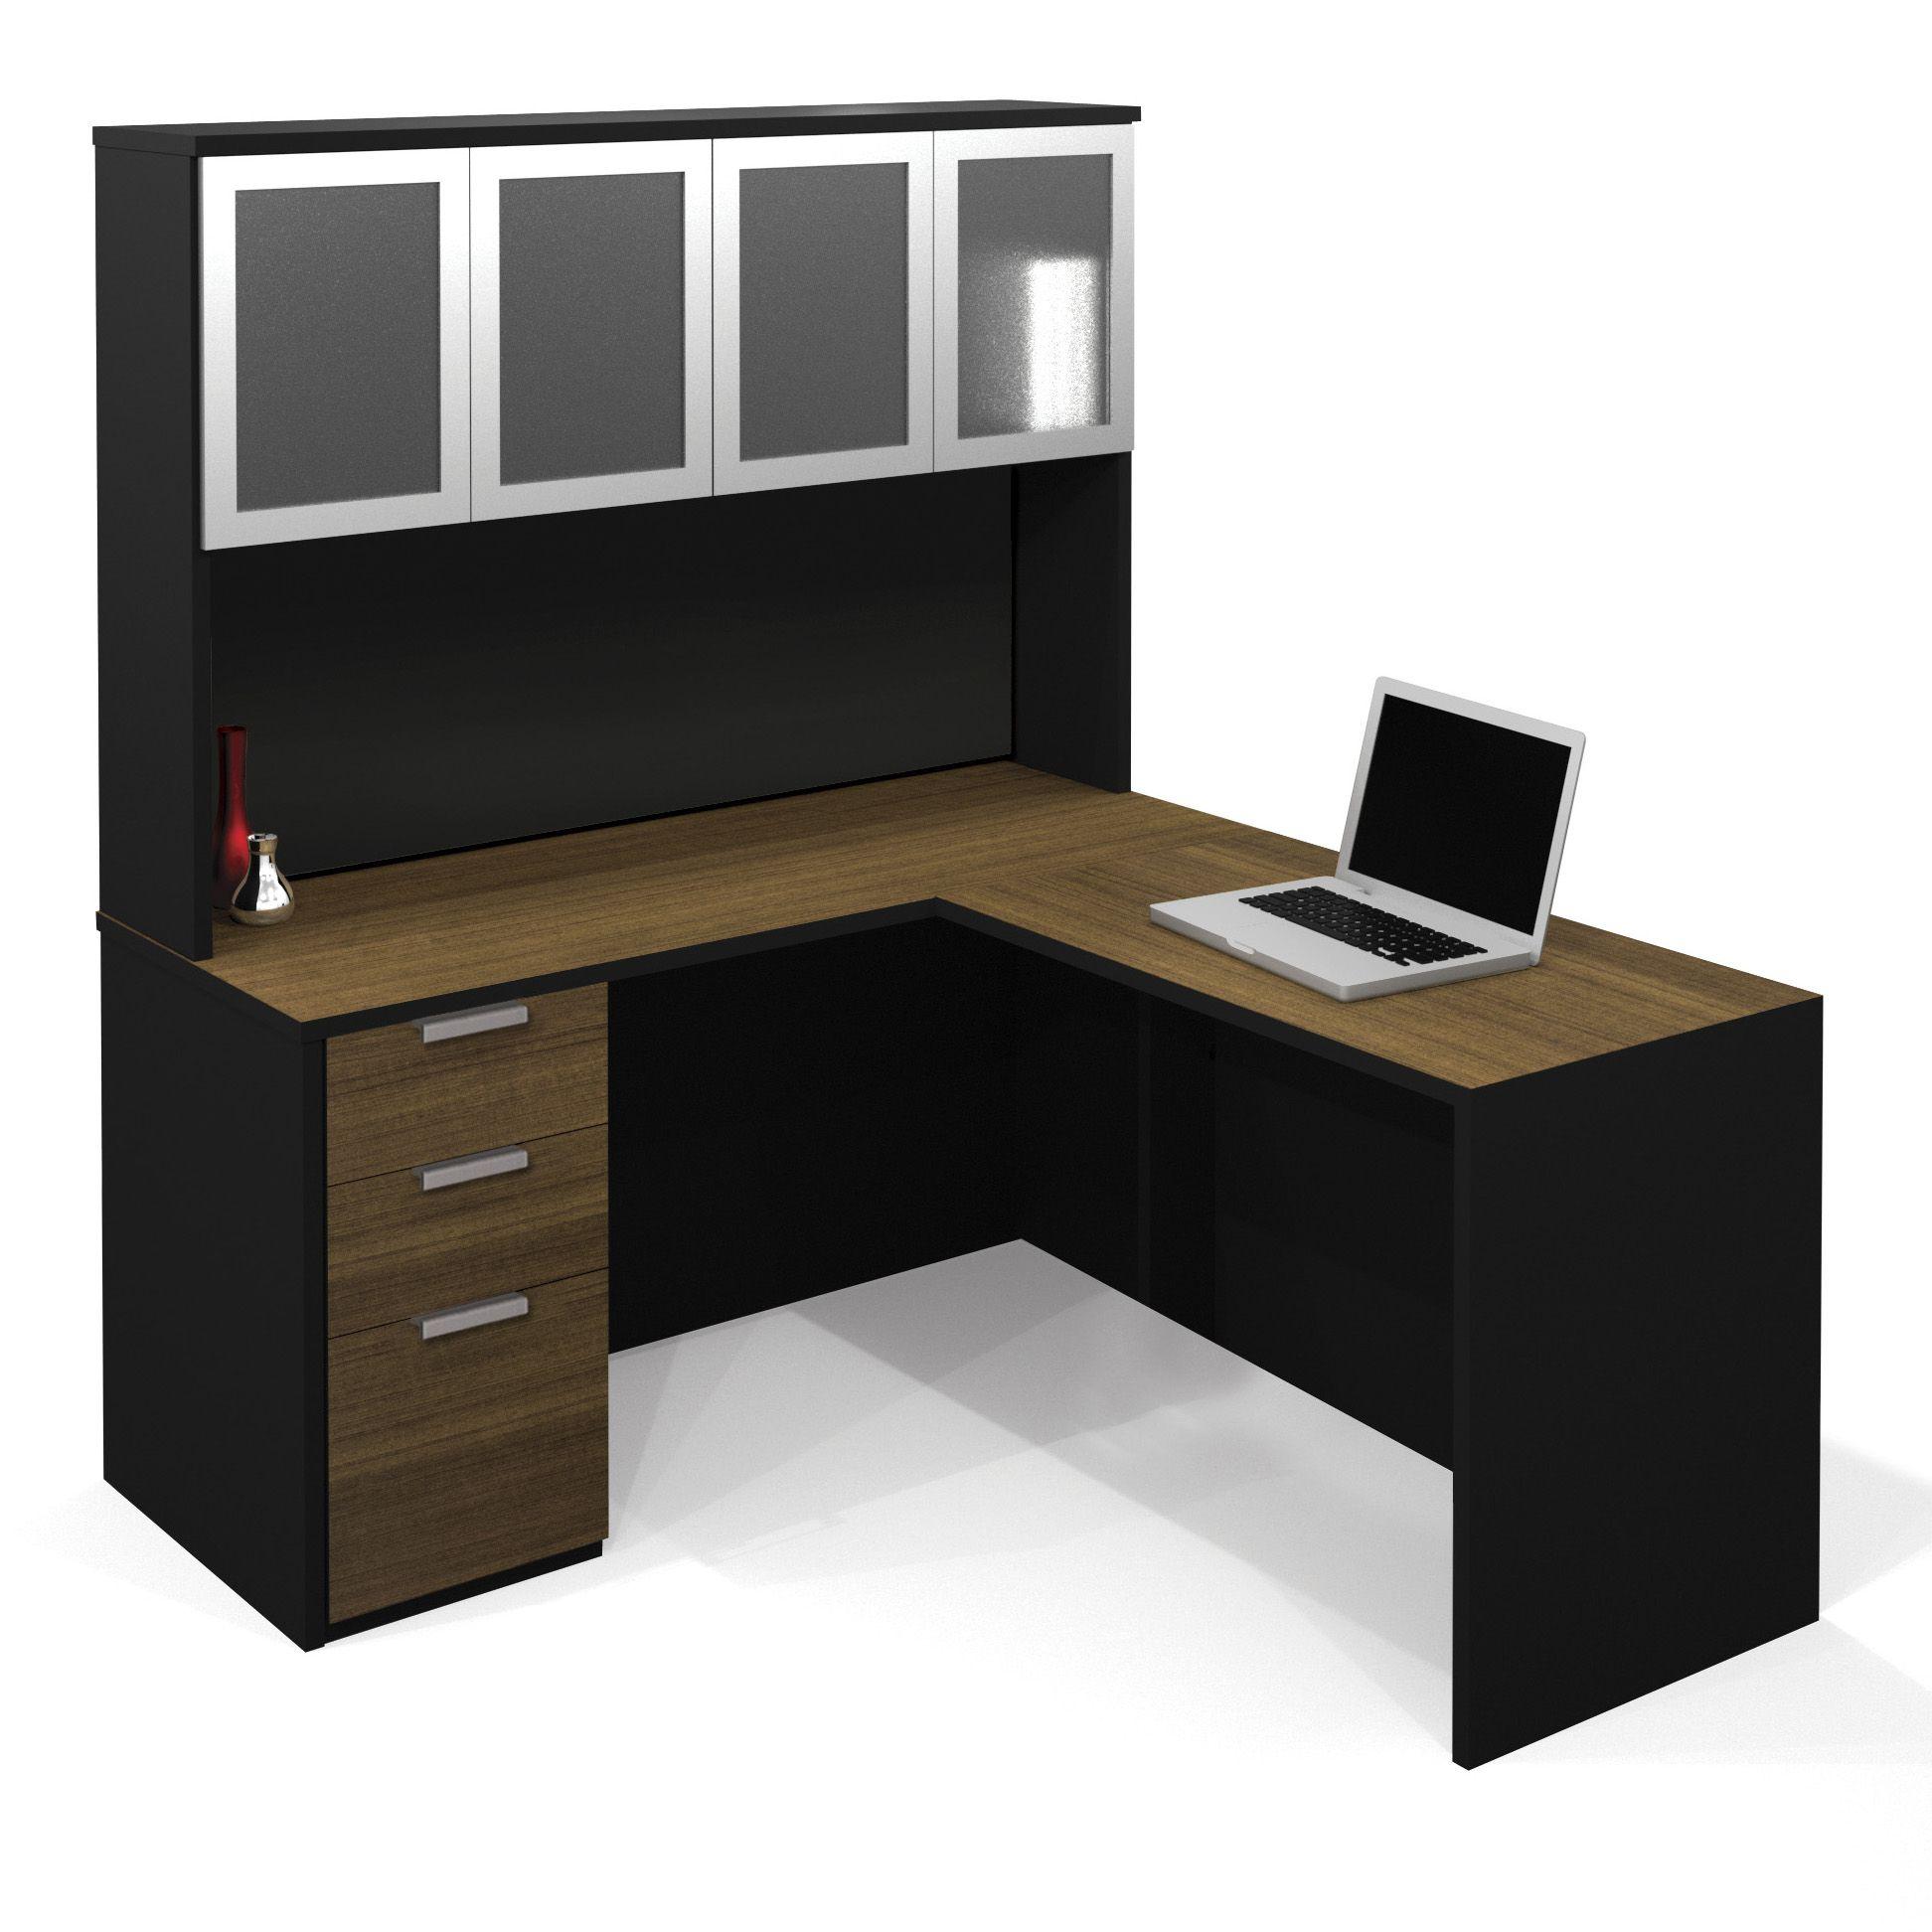 Elegant For Home Office: Corner Desk With Hutch For Modern Home Office Design